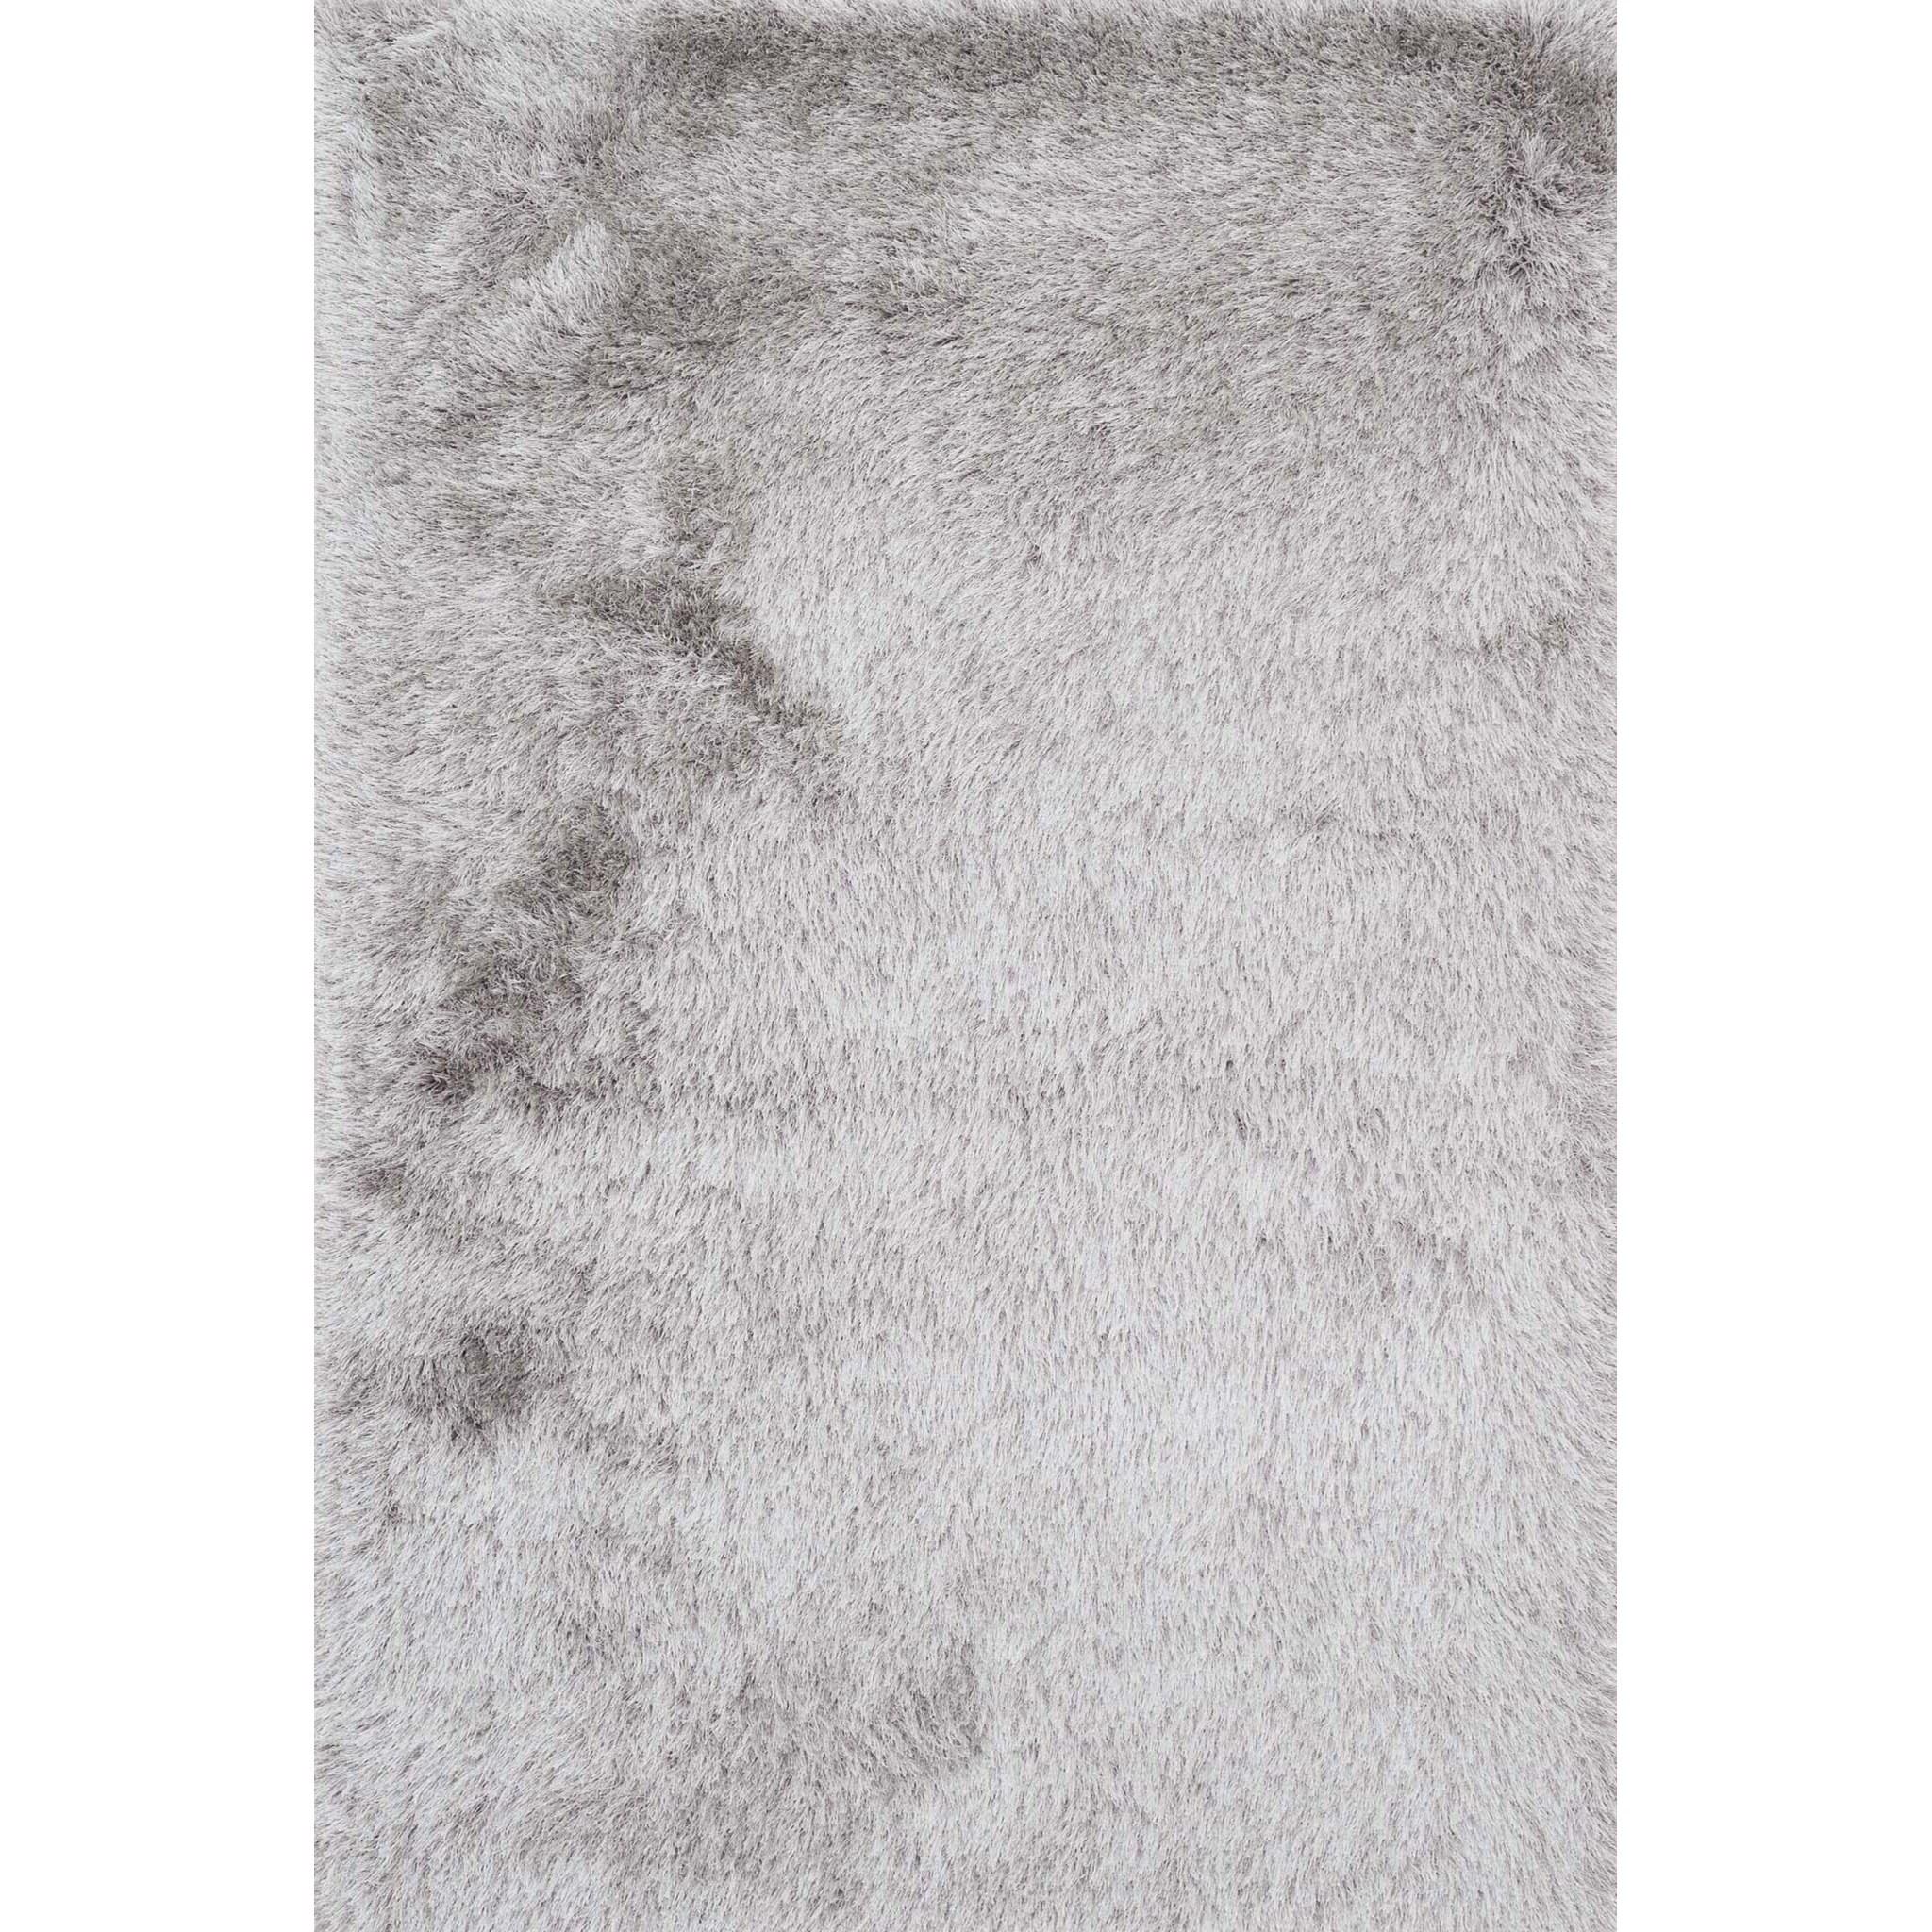 "Orian Shag 3'-6"" x 5'-6"" Area Rug by Loloi Rugs at Virginia Furniture Market"